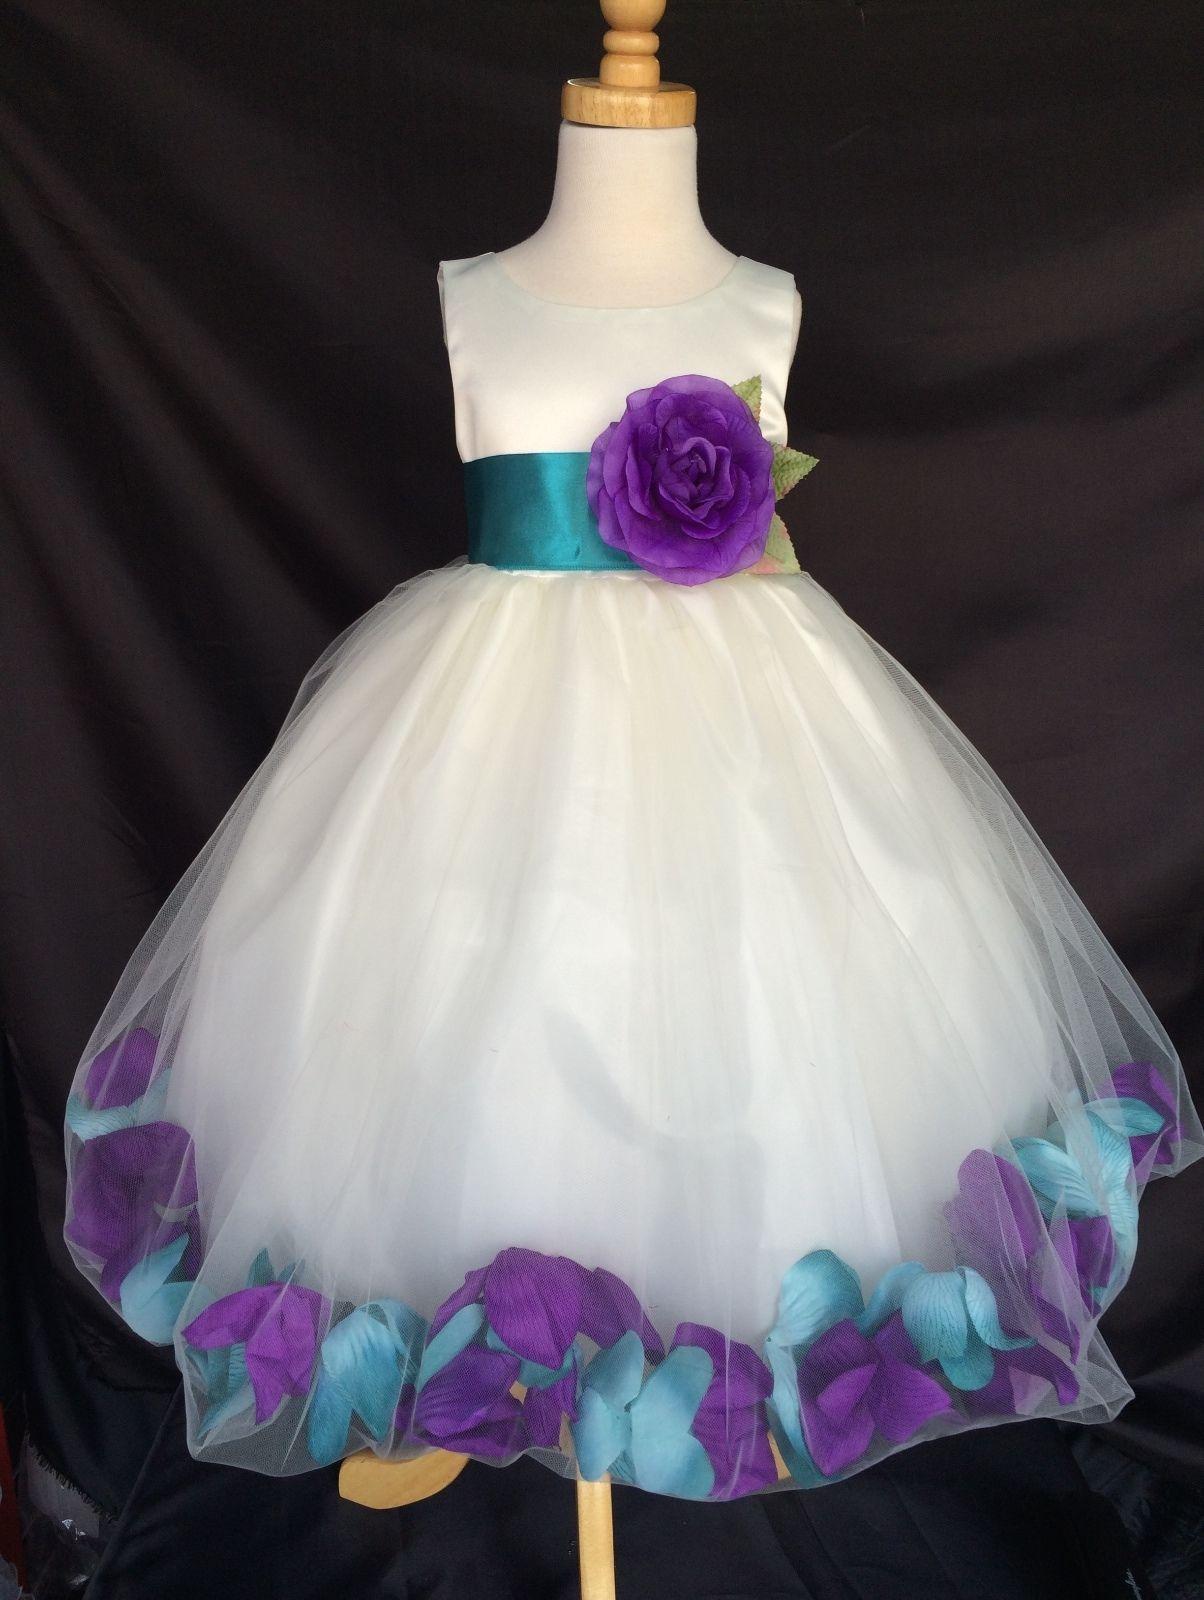 Details about mardi grass ivory flower girl bridesmaids